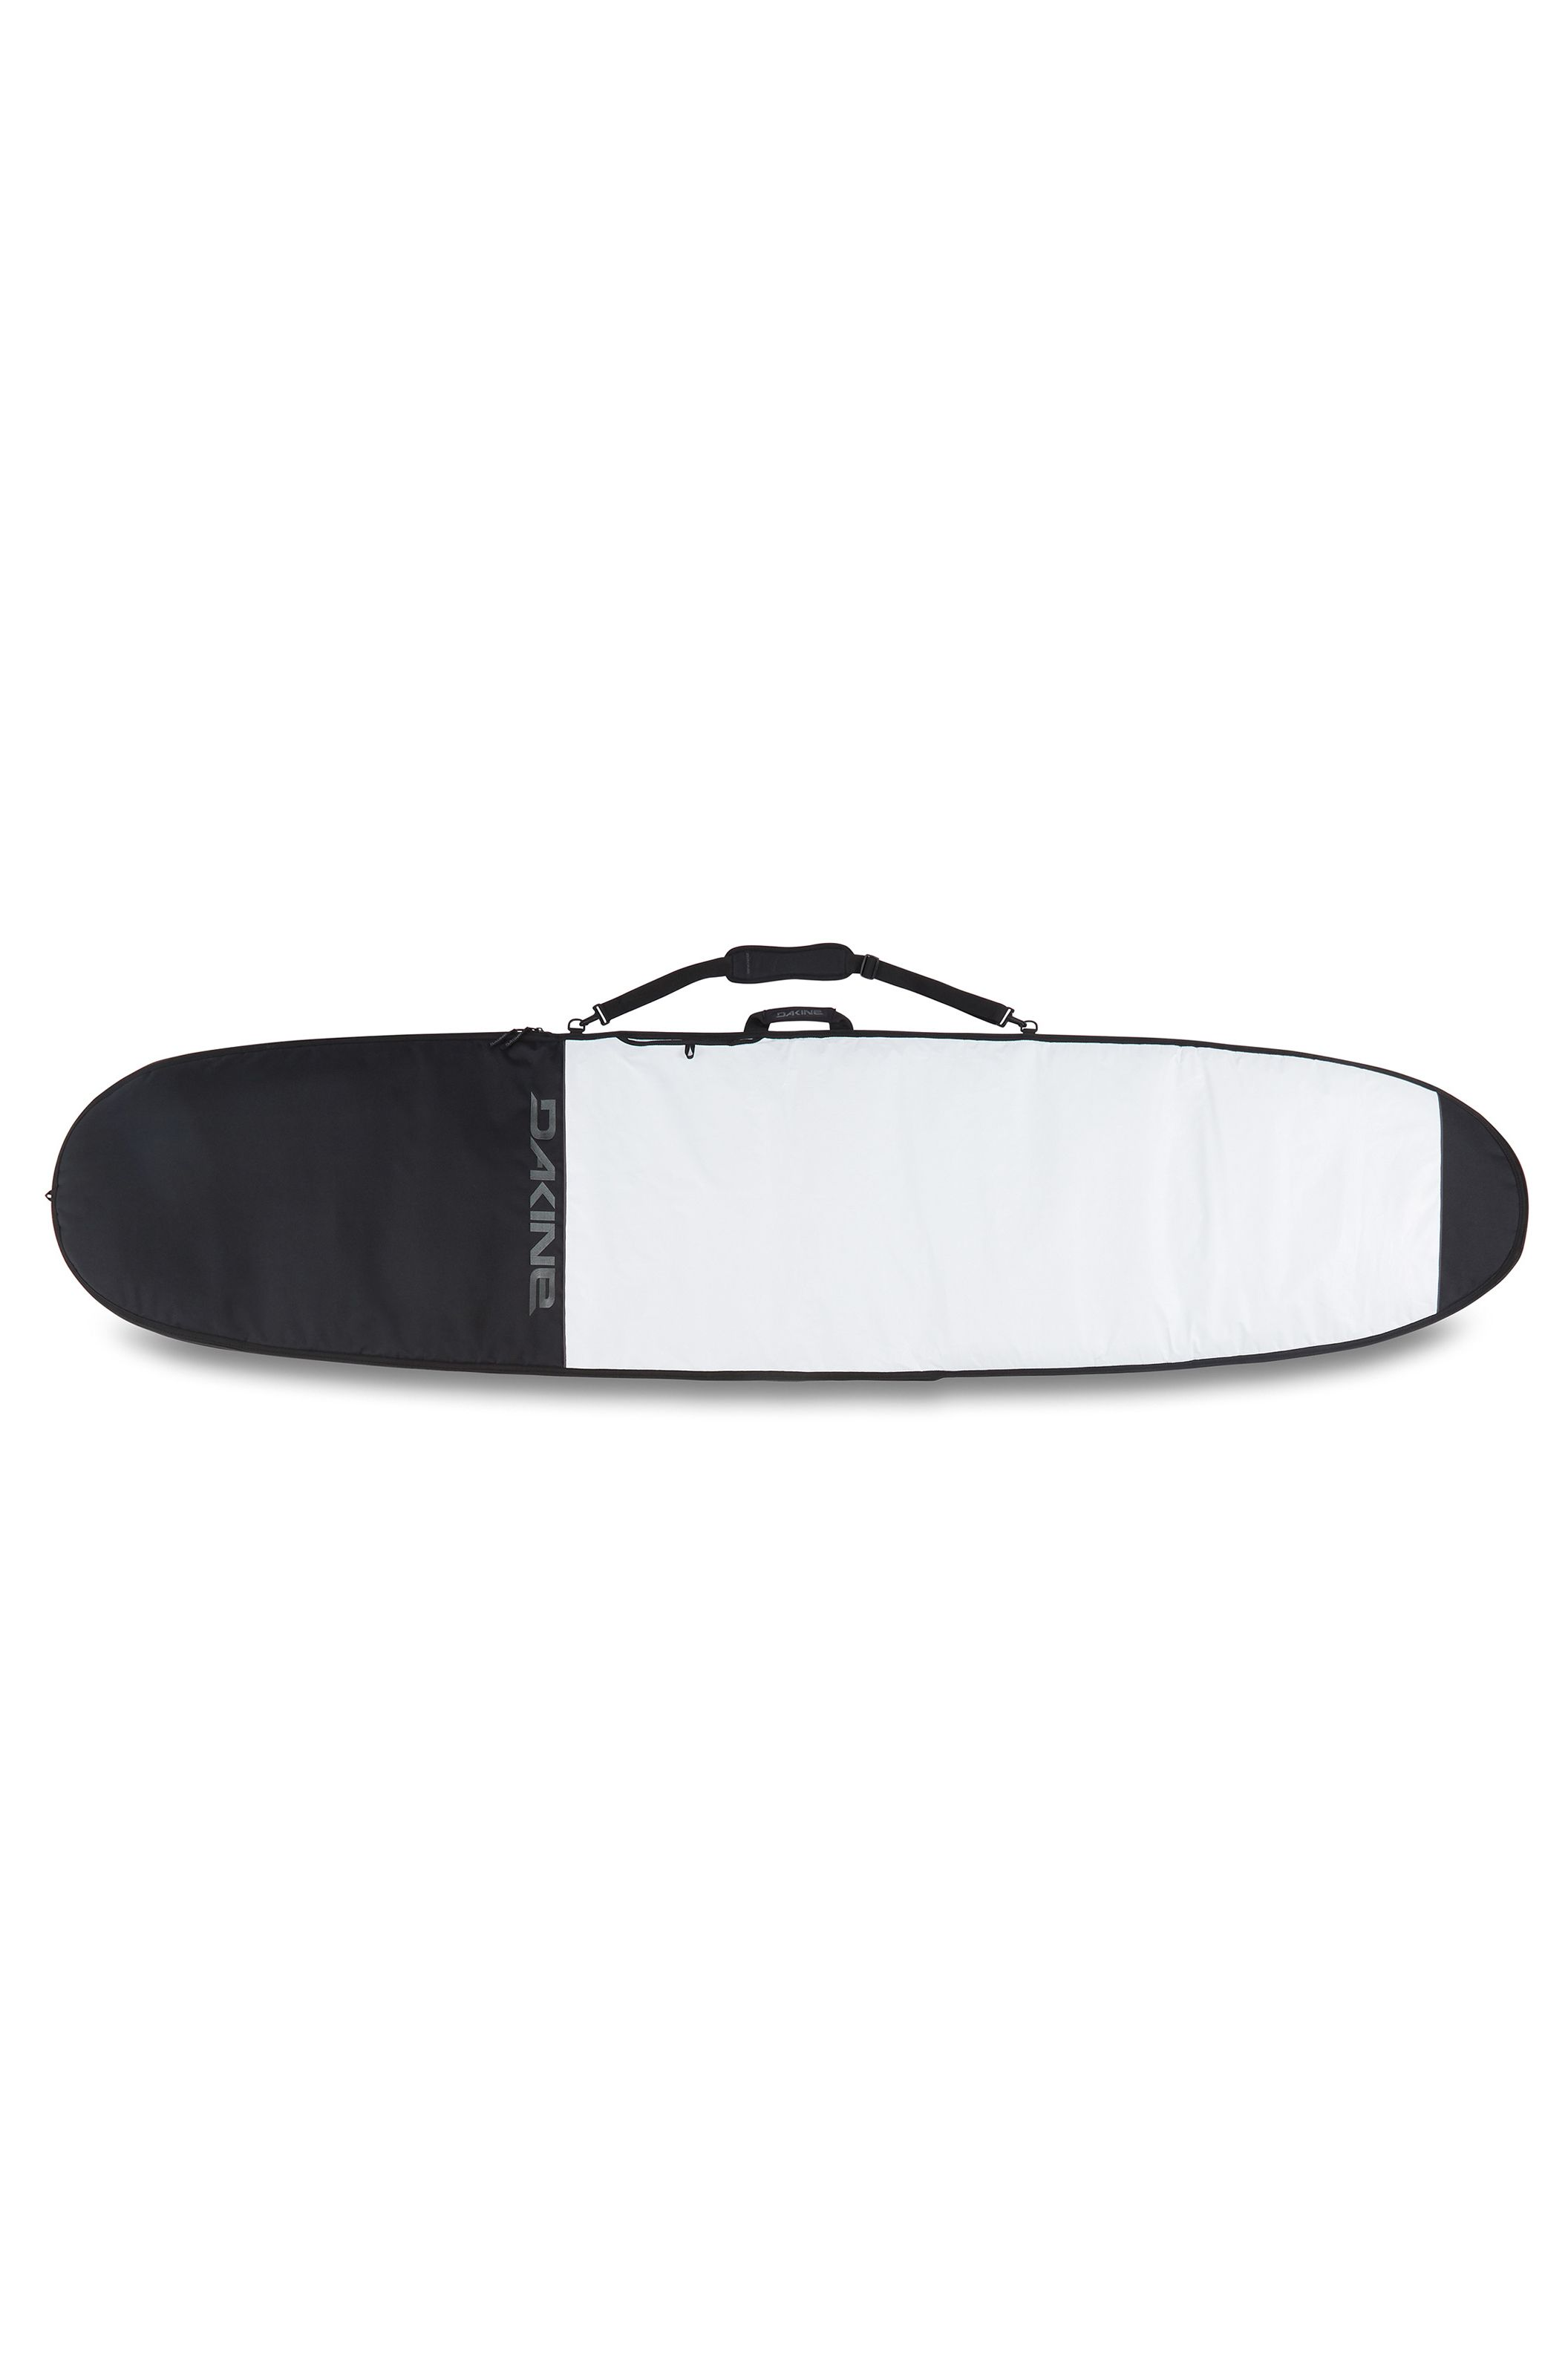 Dakine Boardbag 7'6 DAYLIGHT SURFBOARD BAG NOSERIDER White